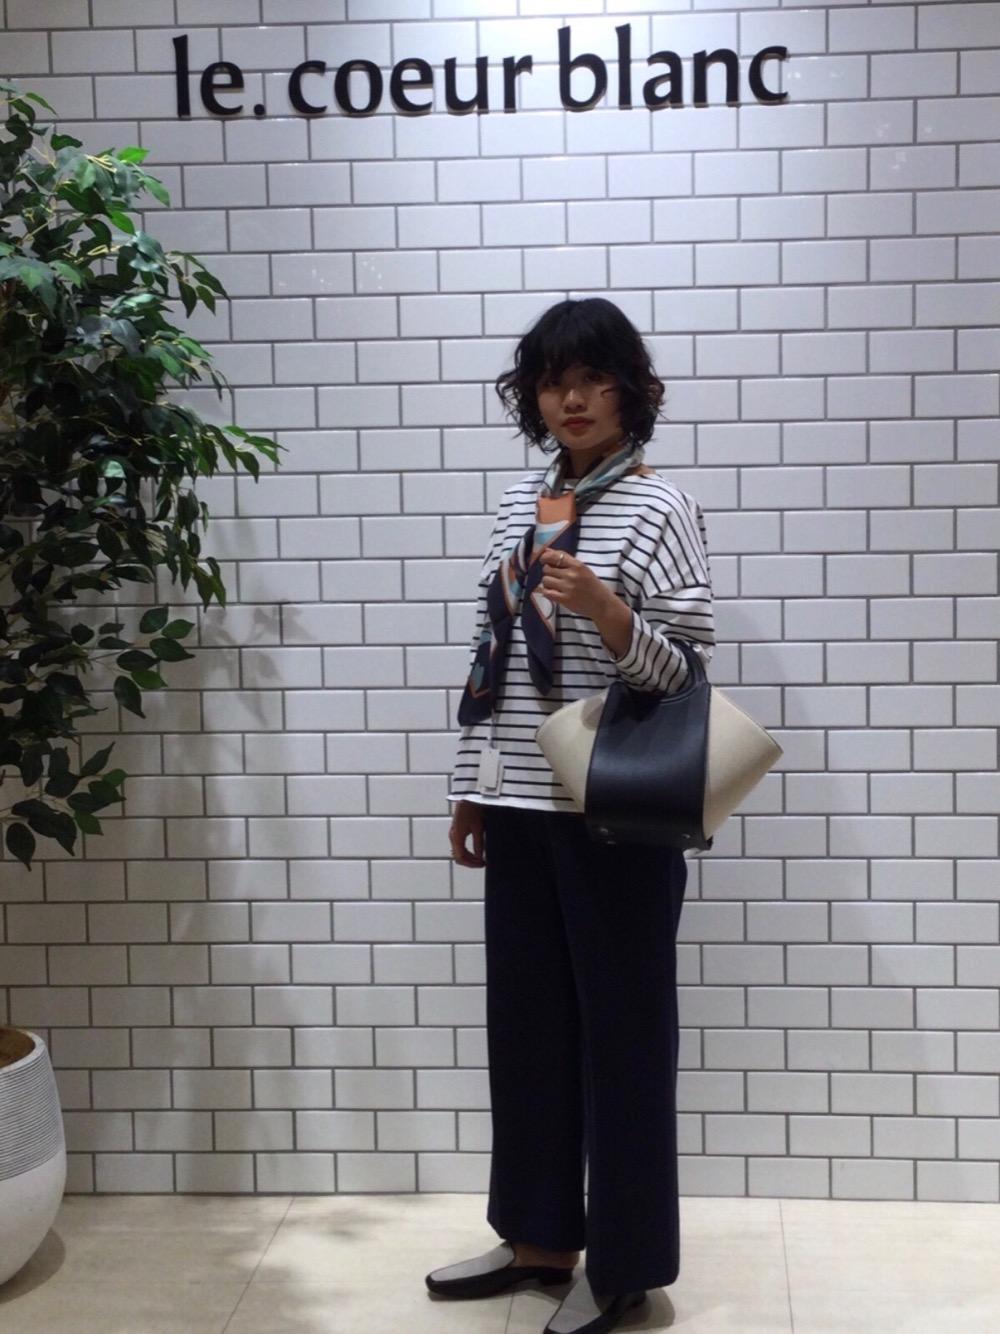 le.coeur blancシャミネ松江店